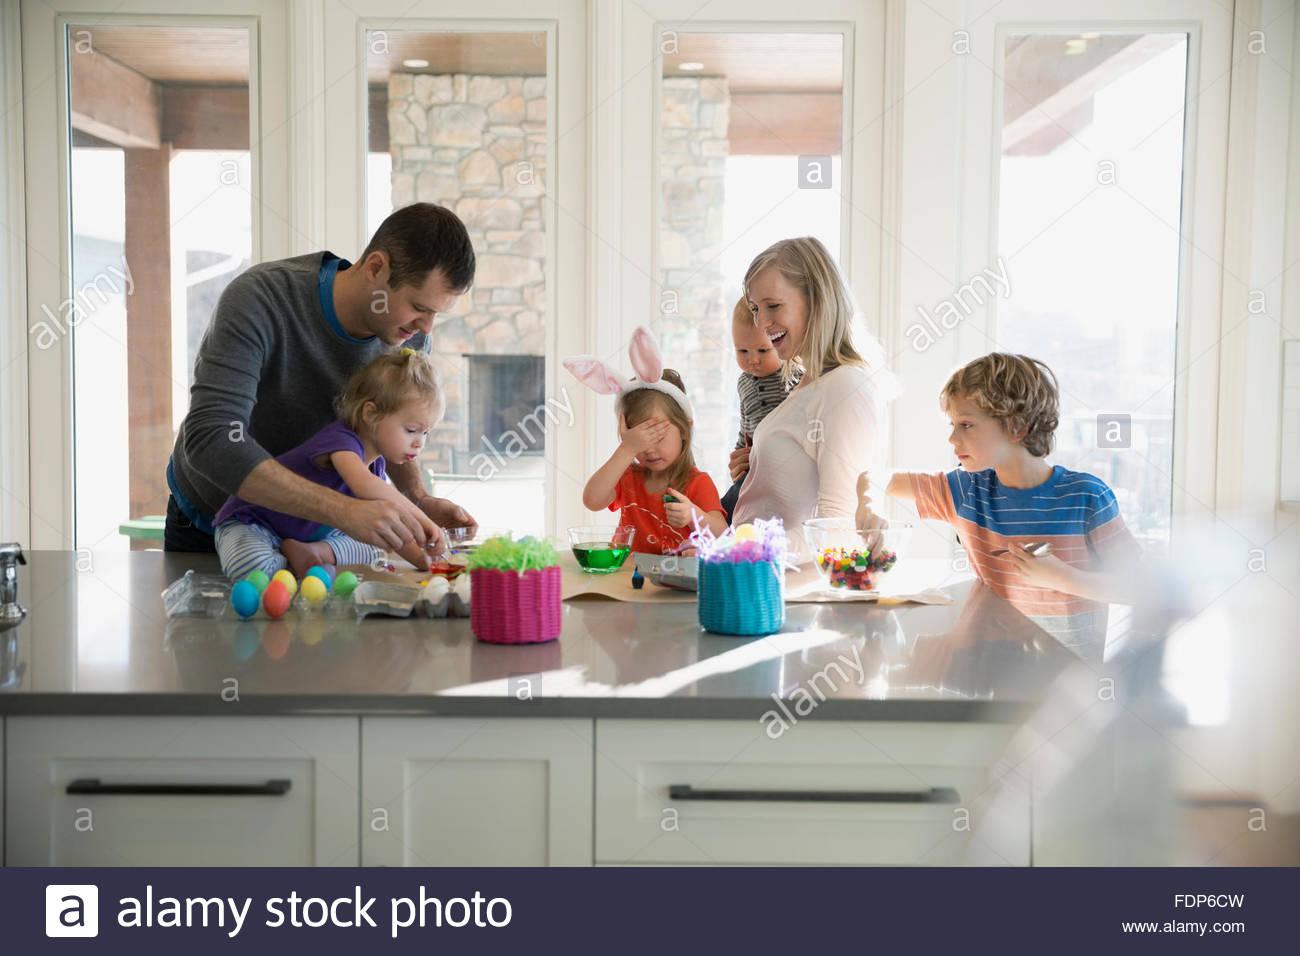 Egg Dye Stockfotos & Egg Dye Bilder - Alamy